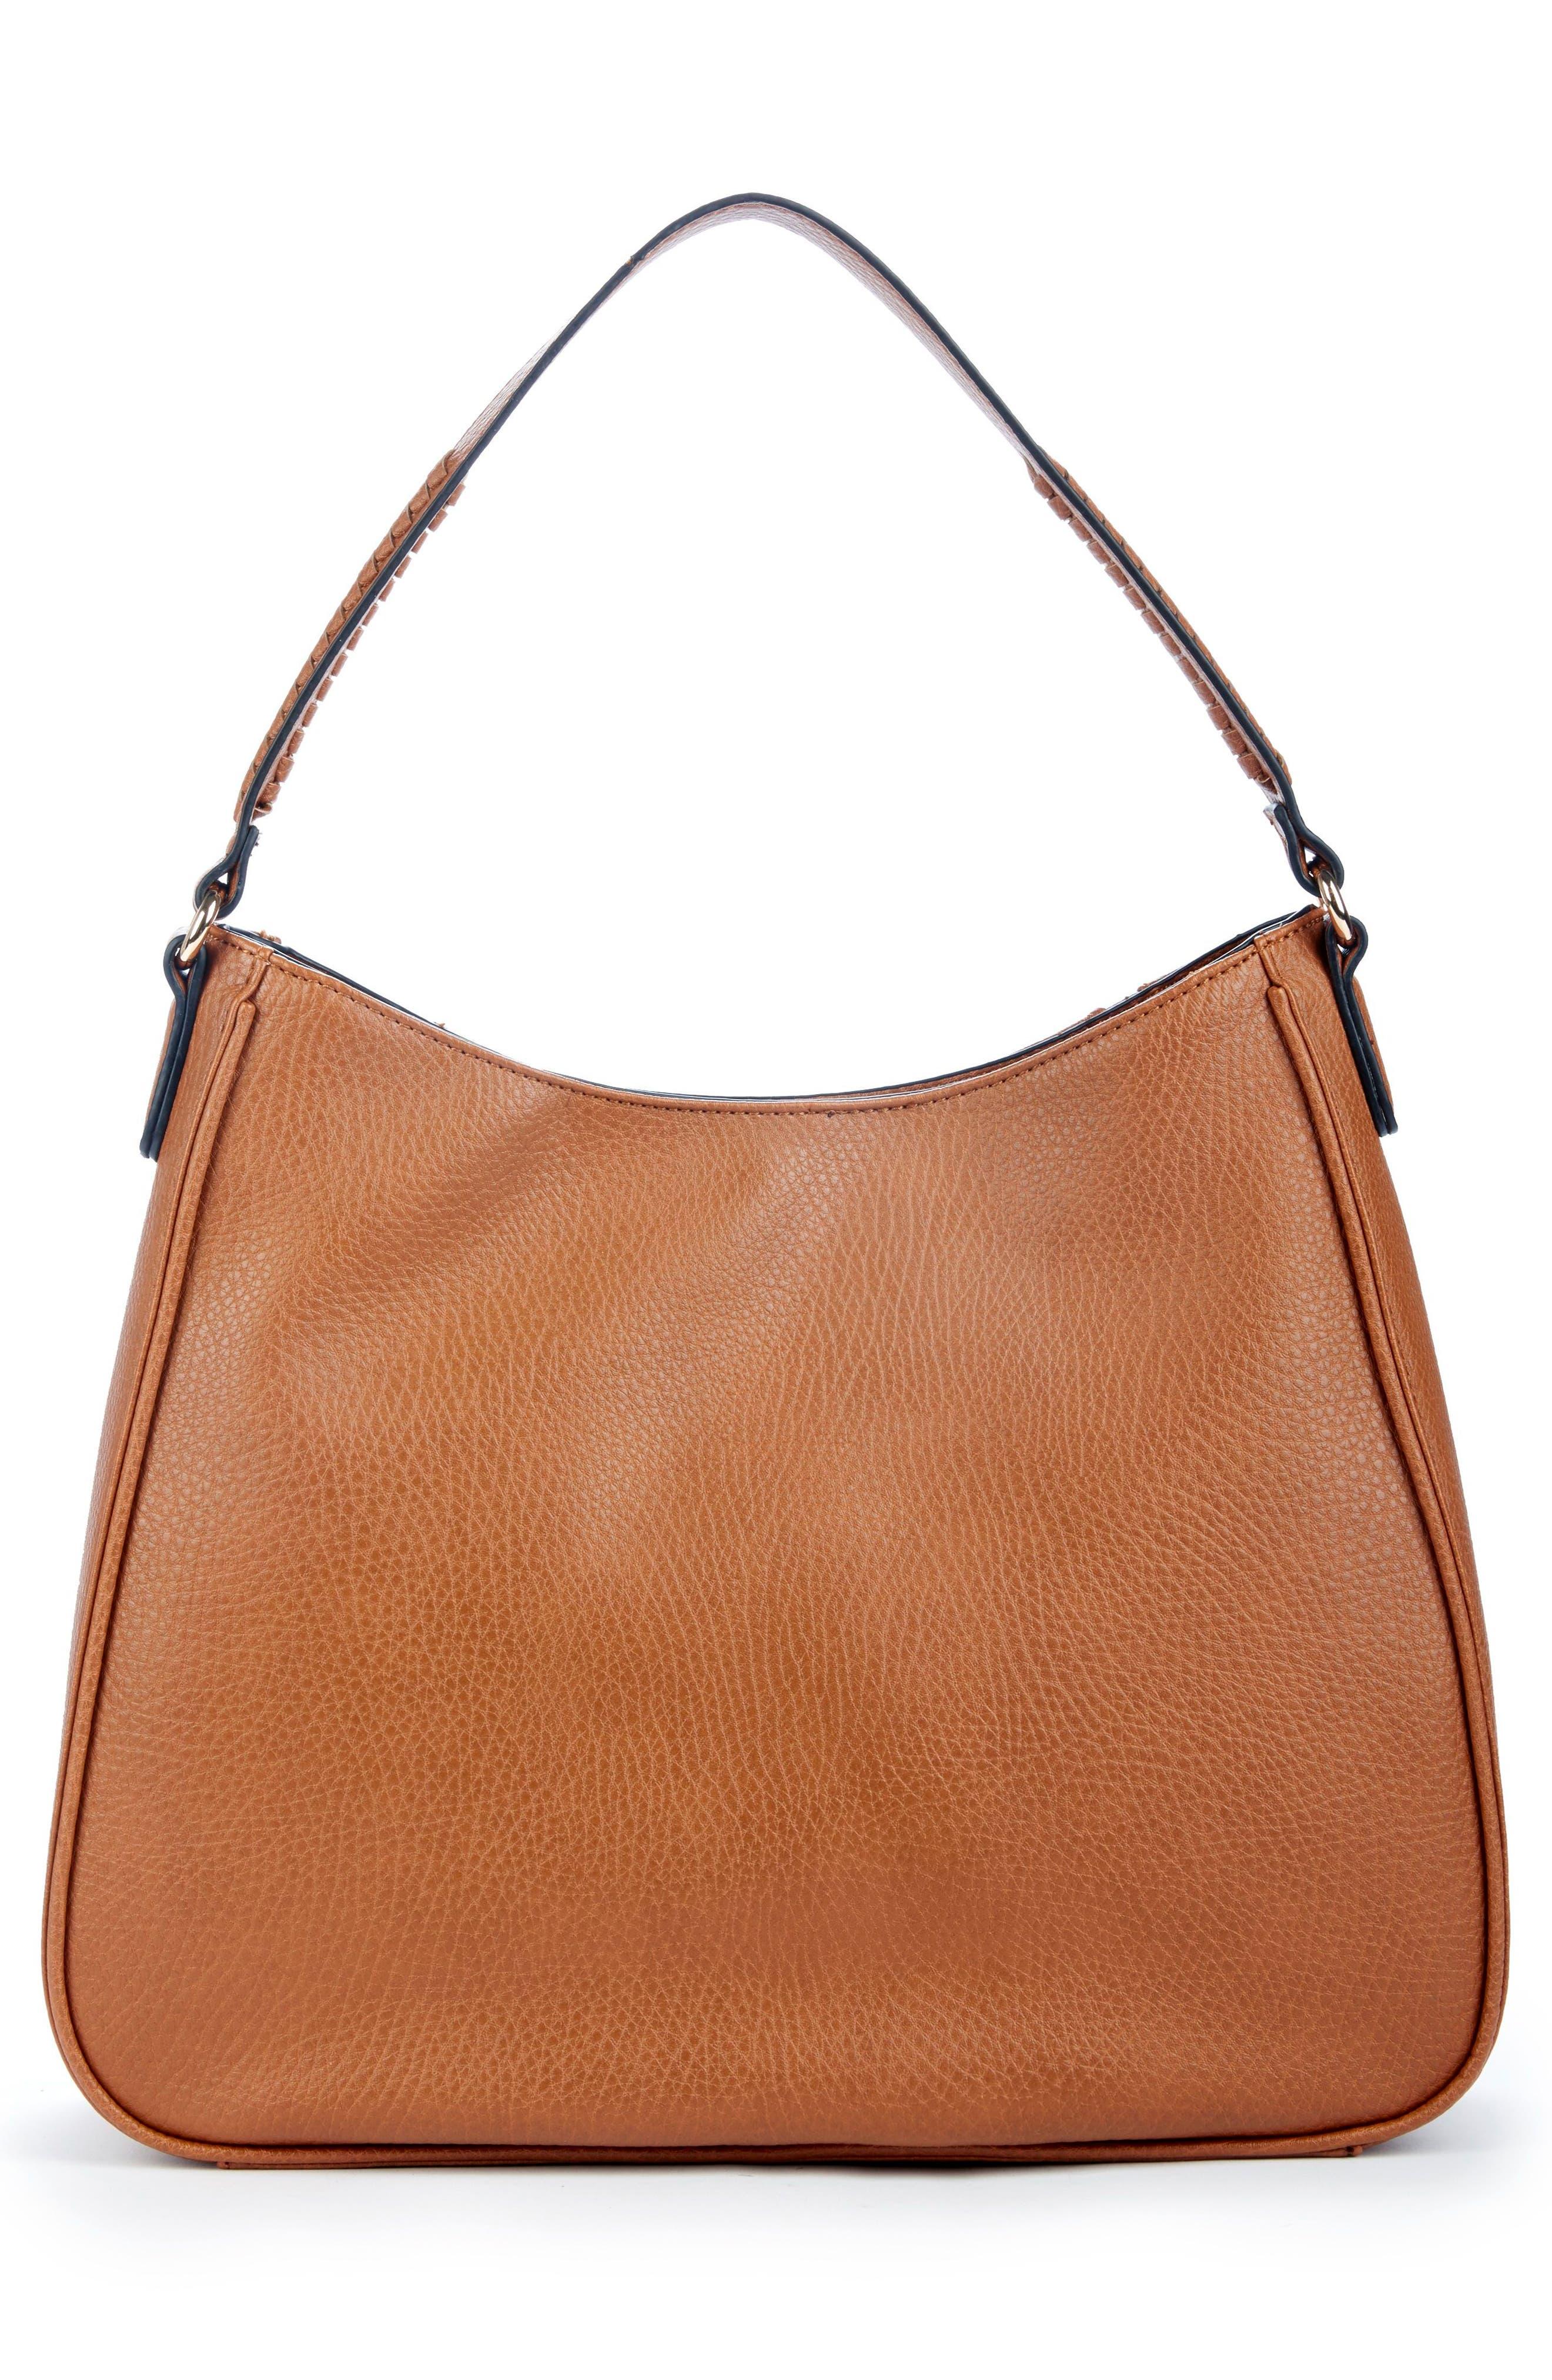 Sarafina Faux Leather Shoulder Bag,                             Alternate thumbnail 2, color,                             Cognac